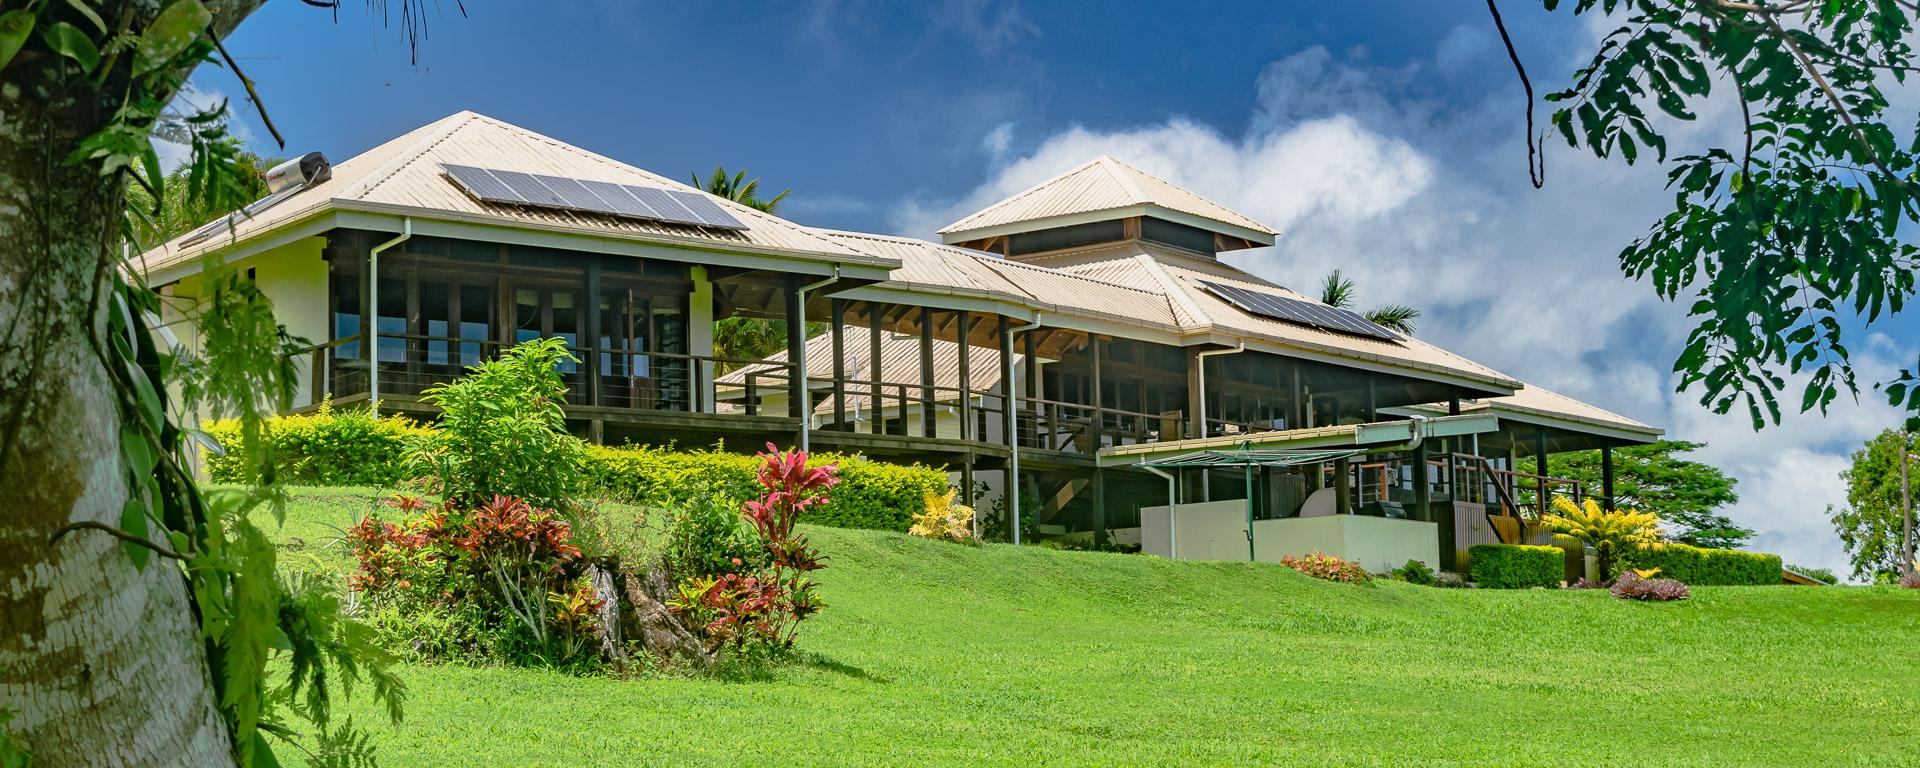 Fiji Property For Sale Taveuni Freehold Real Estate 01